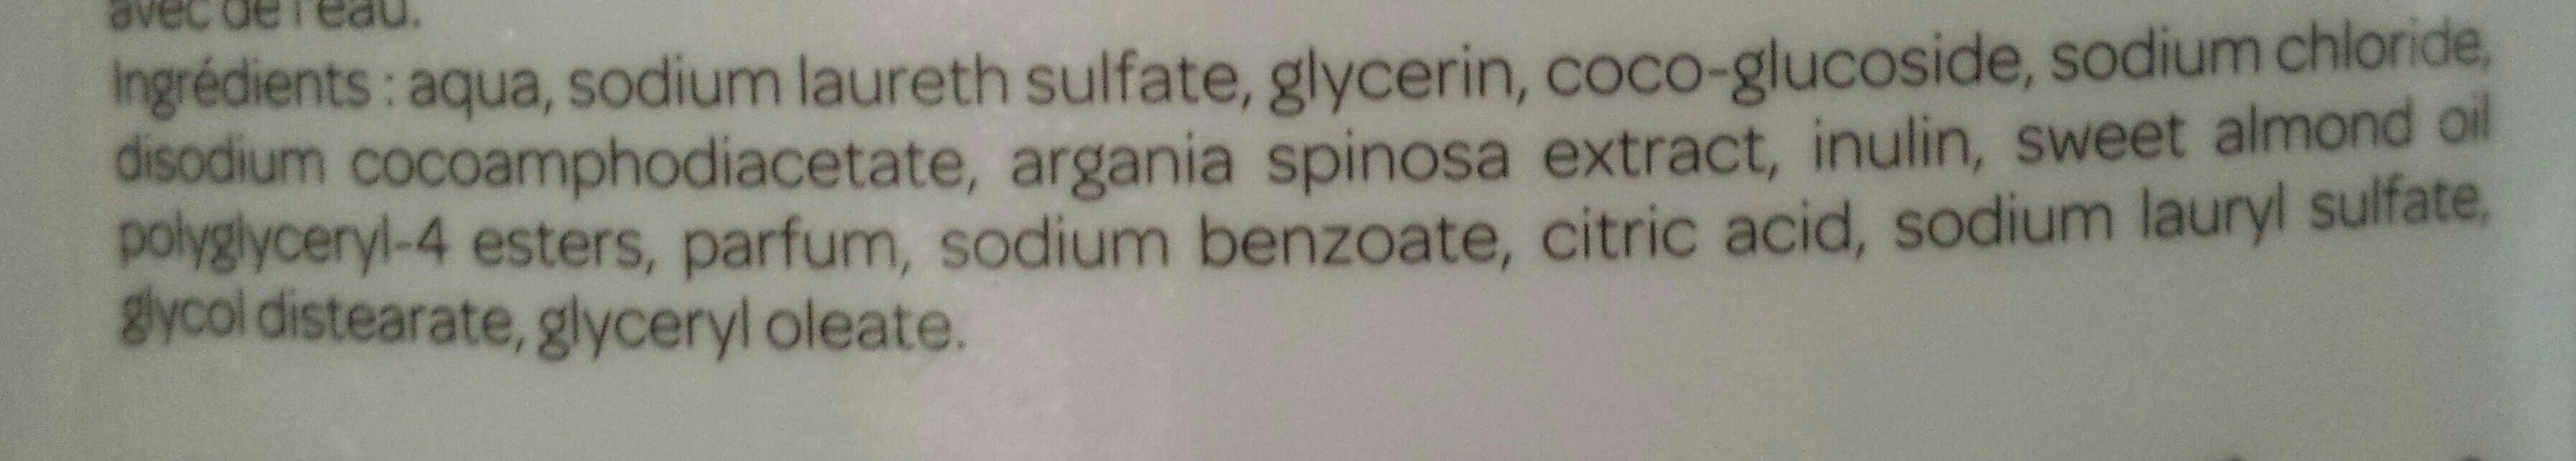 Douche soin hydratation intense - Ingredients